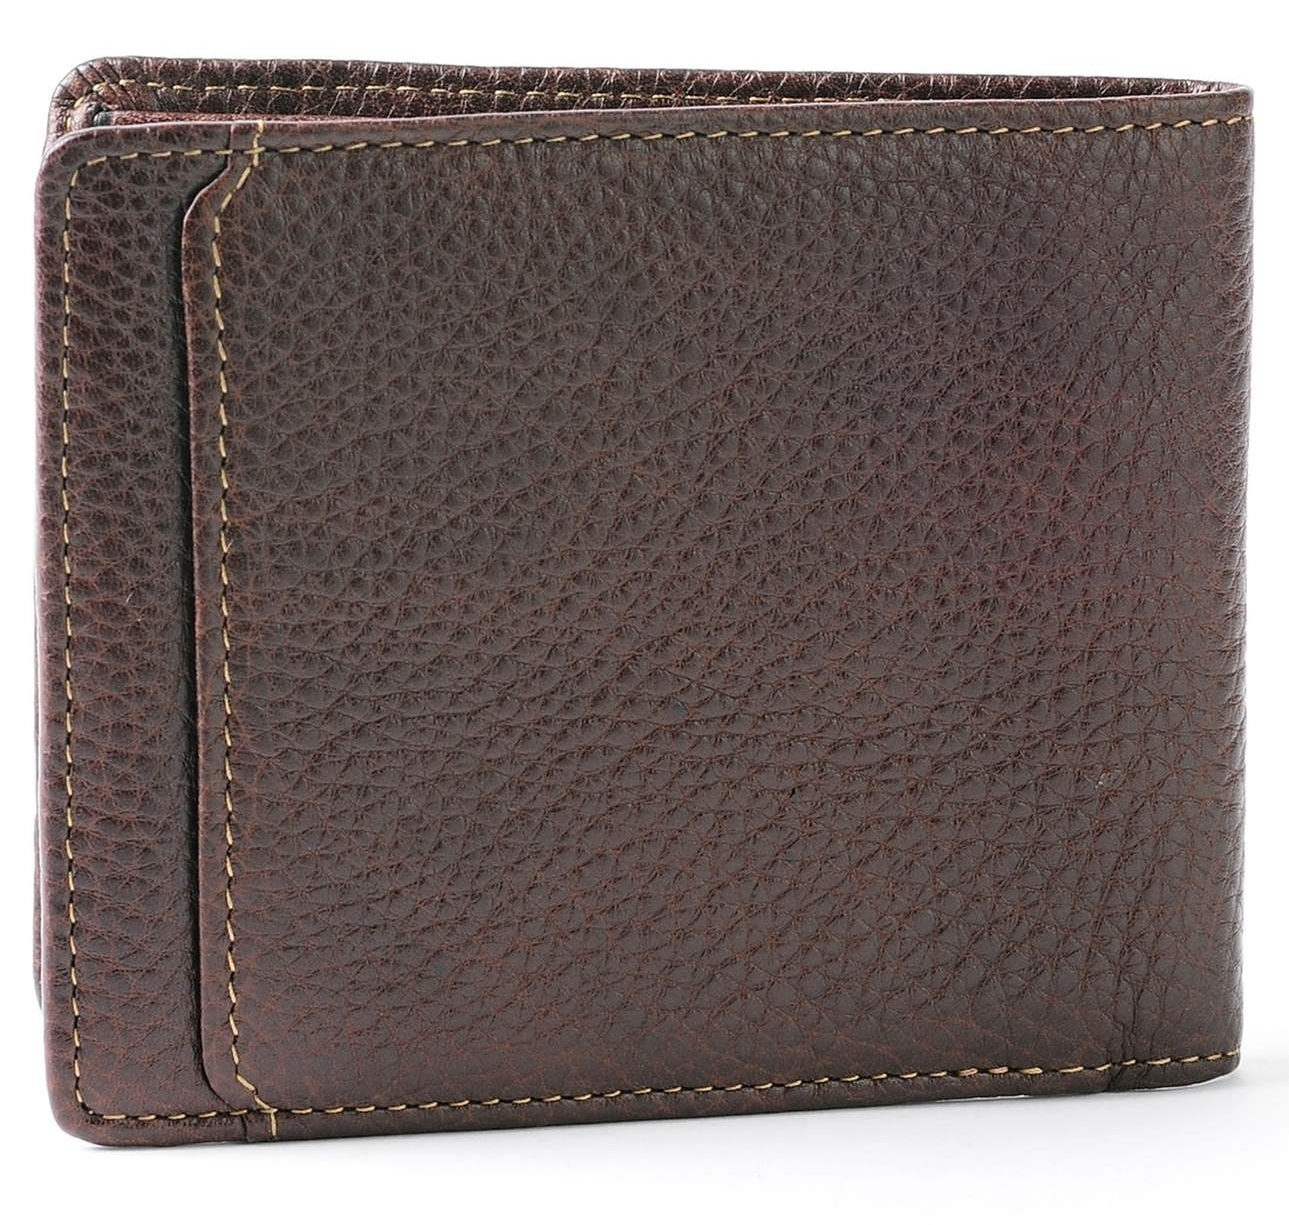 BOCONITyler RFID Wallet